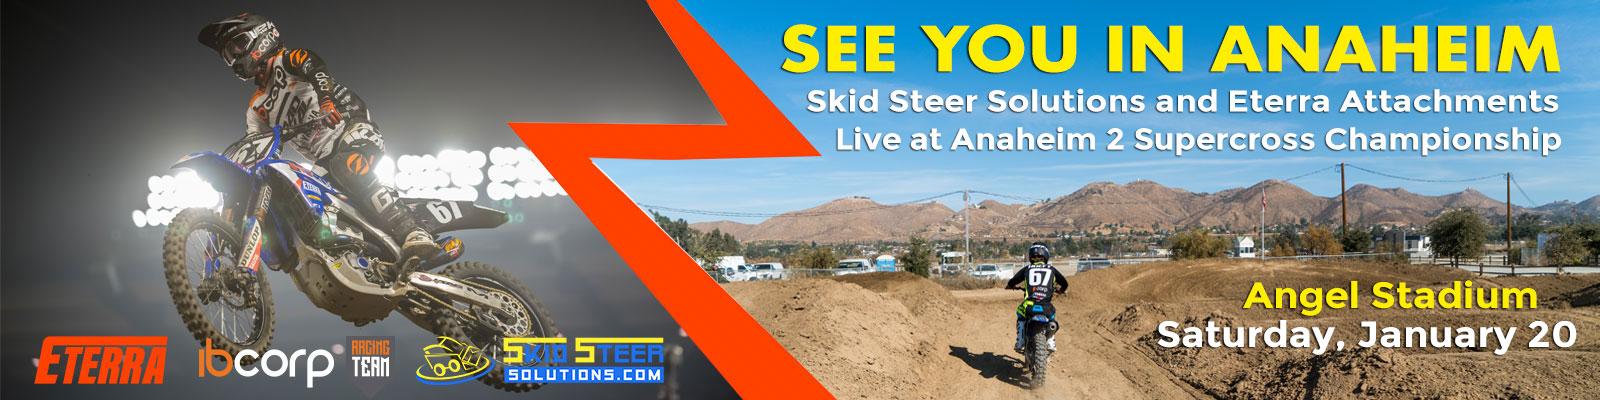 Skid Steer Solutions Anaheim 2 Supercross